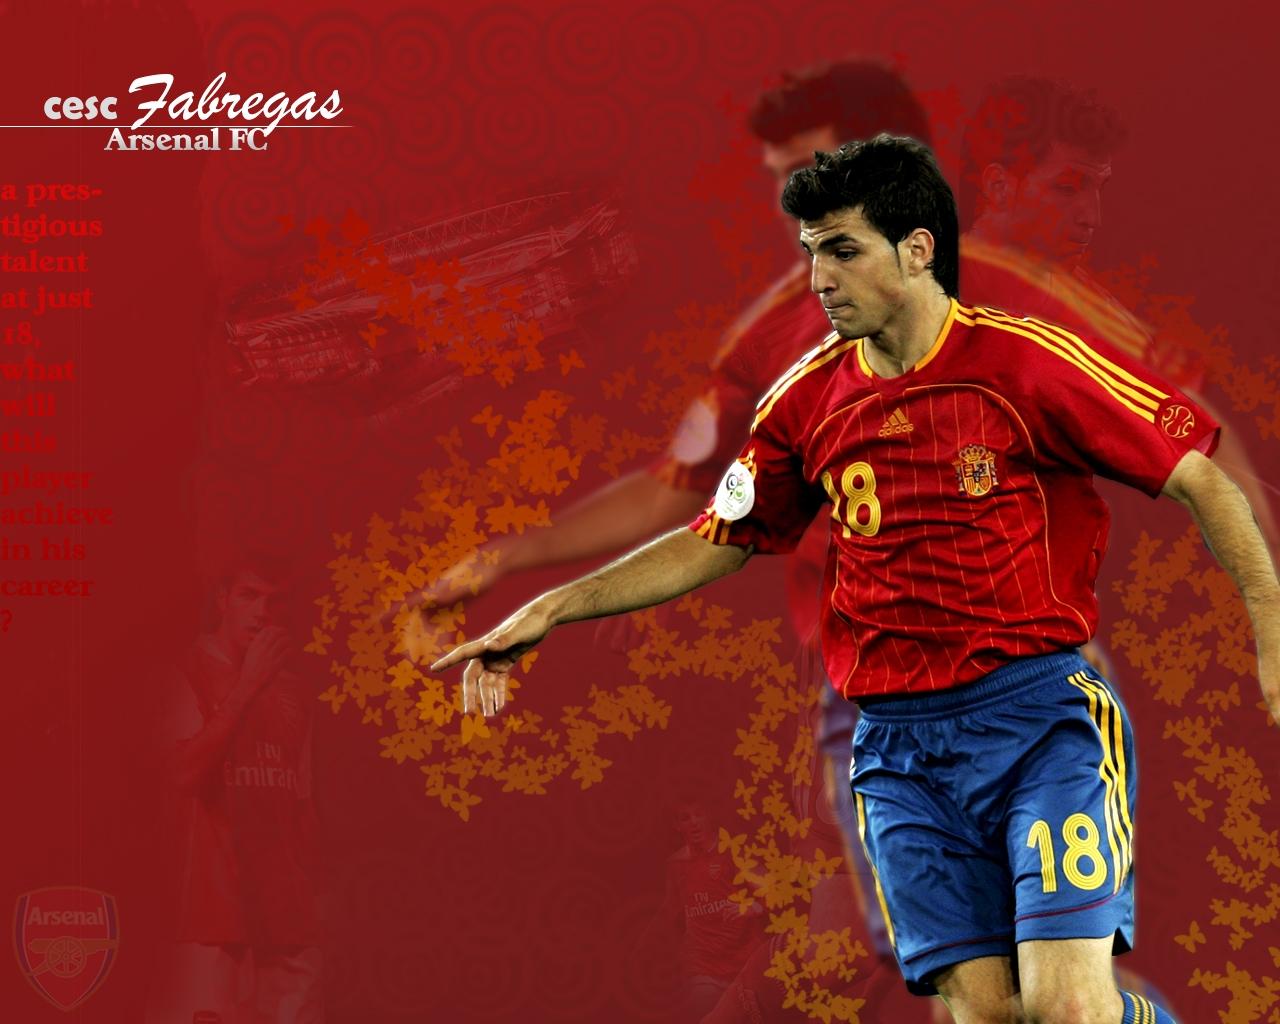 Cesc Fabregas Football Wallpaper 1280x1024